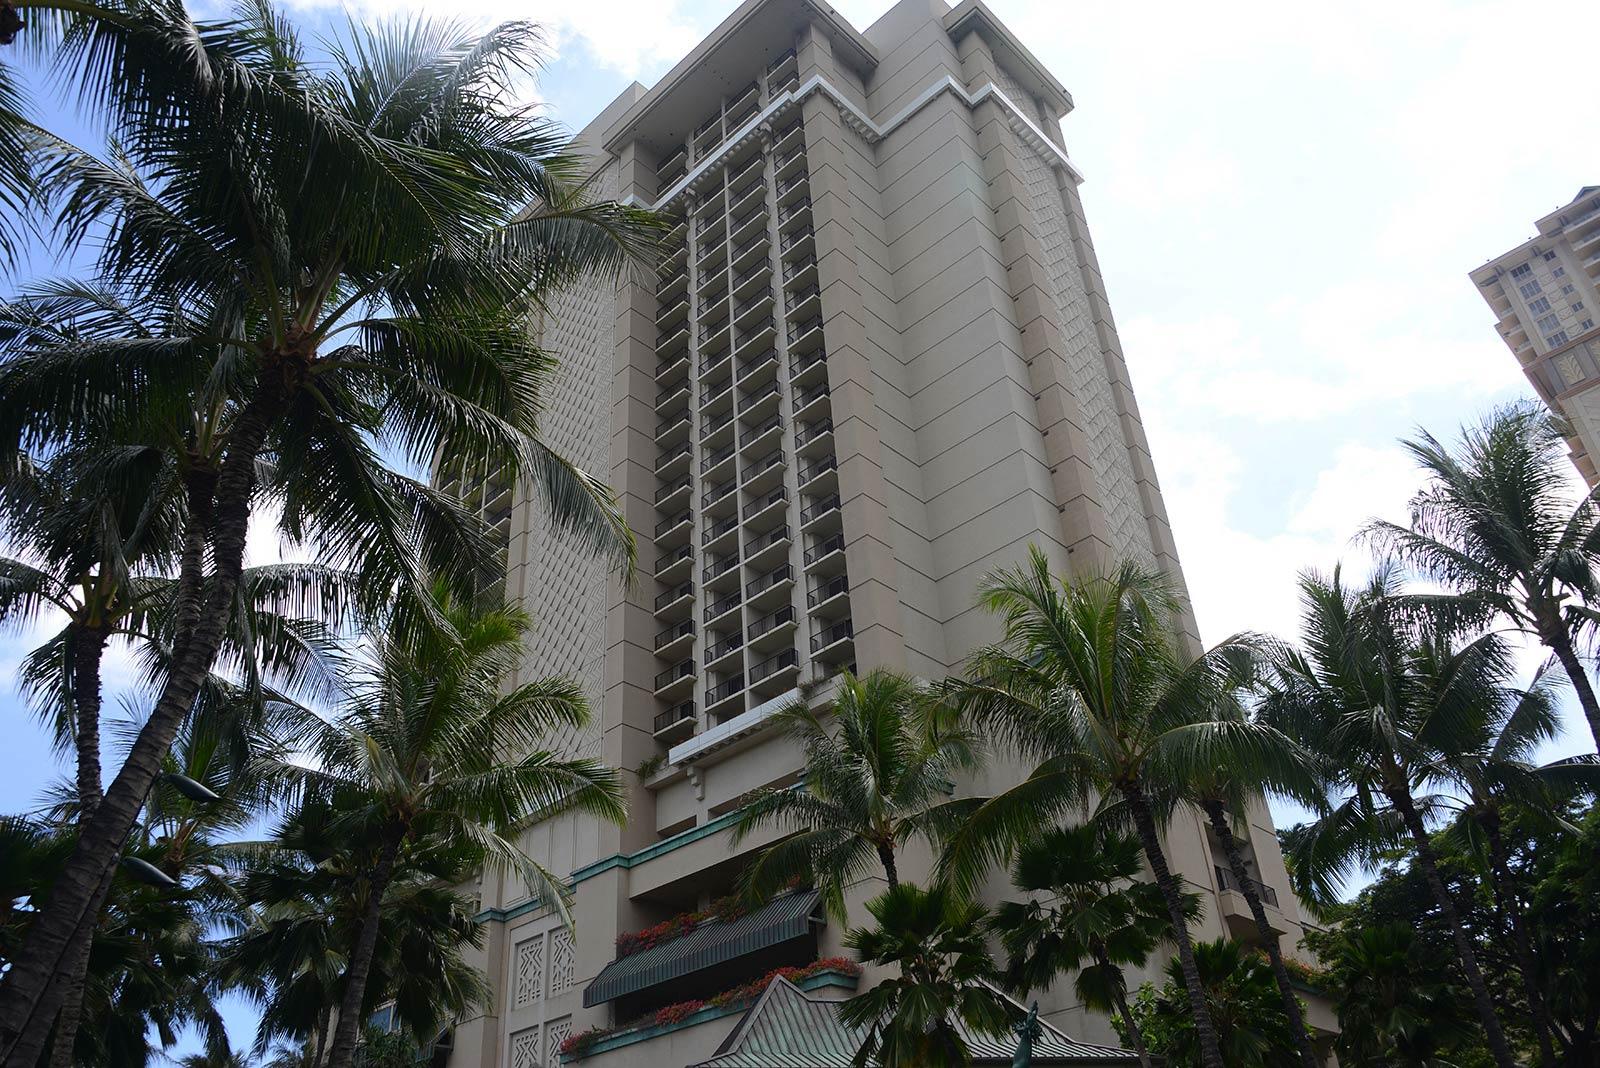 hilton-grand-vacation-suites-at-hilton-hawaiian-village-kalia-tower-27